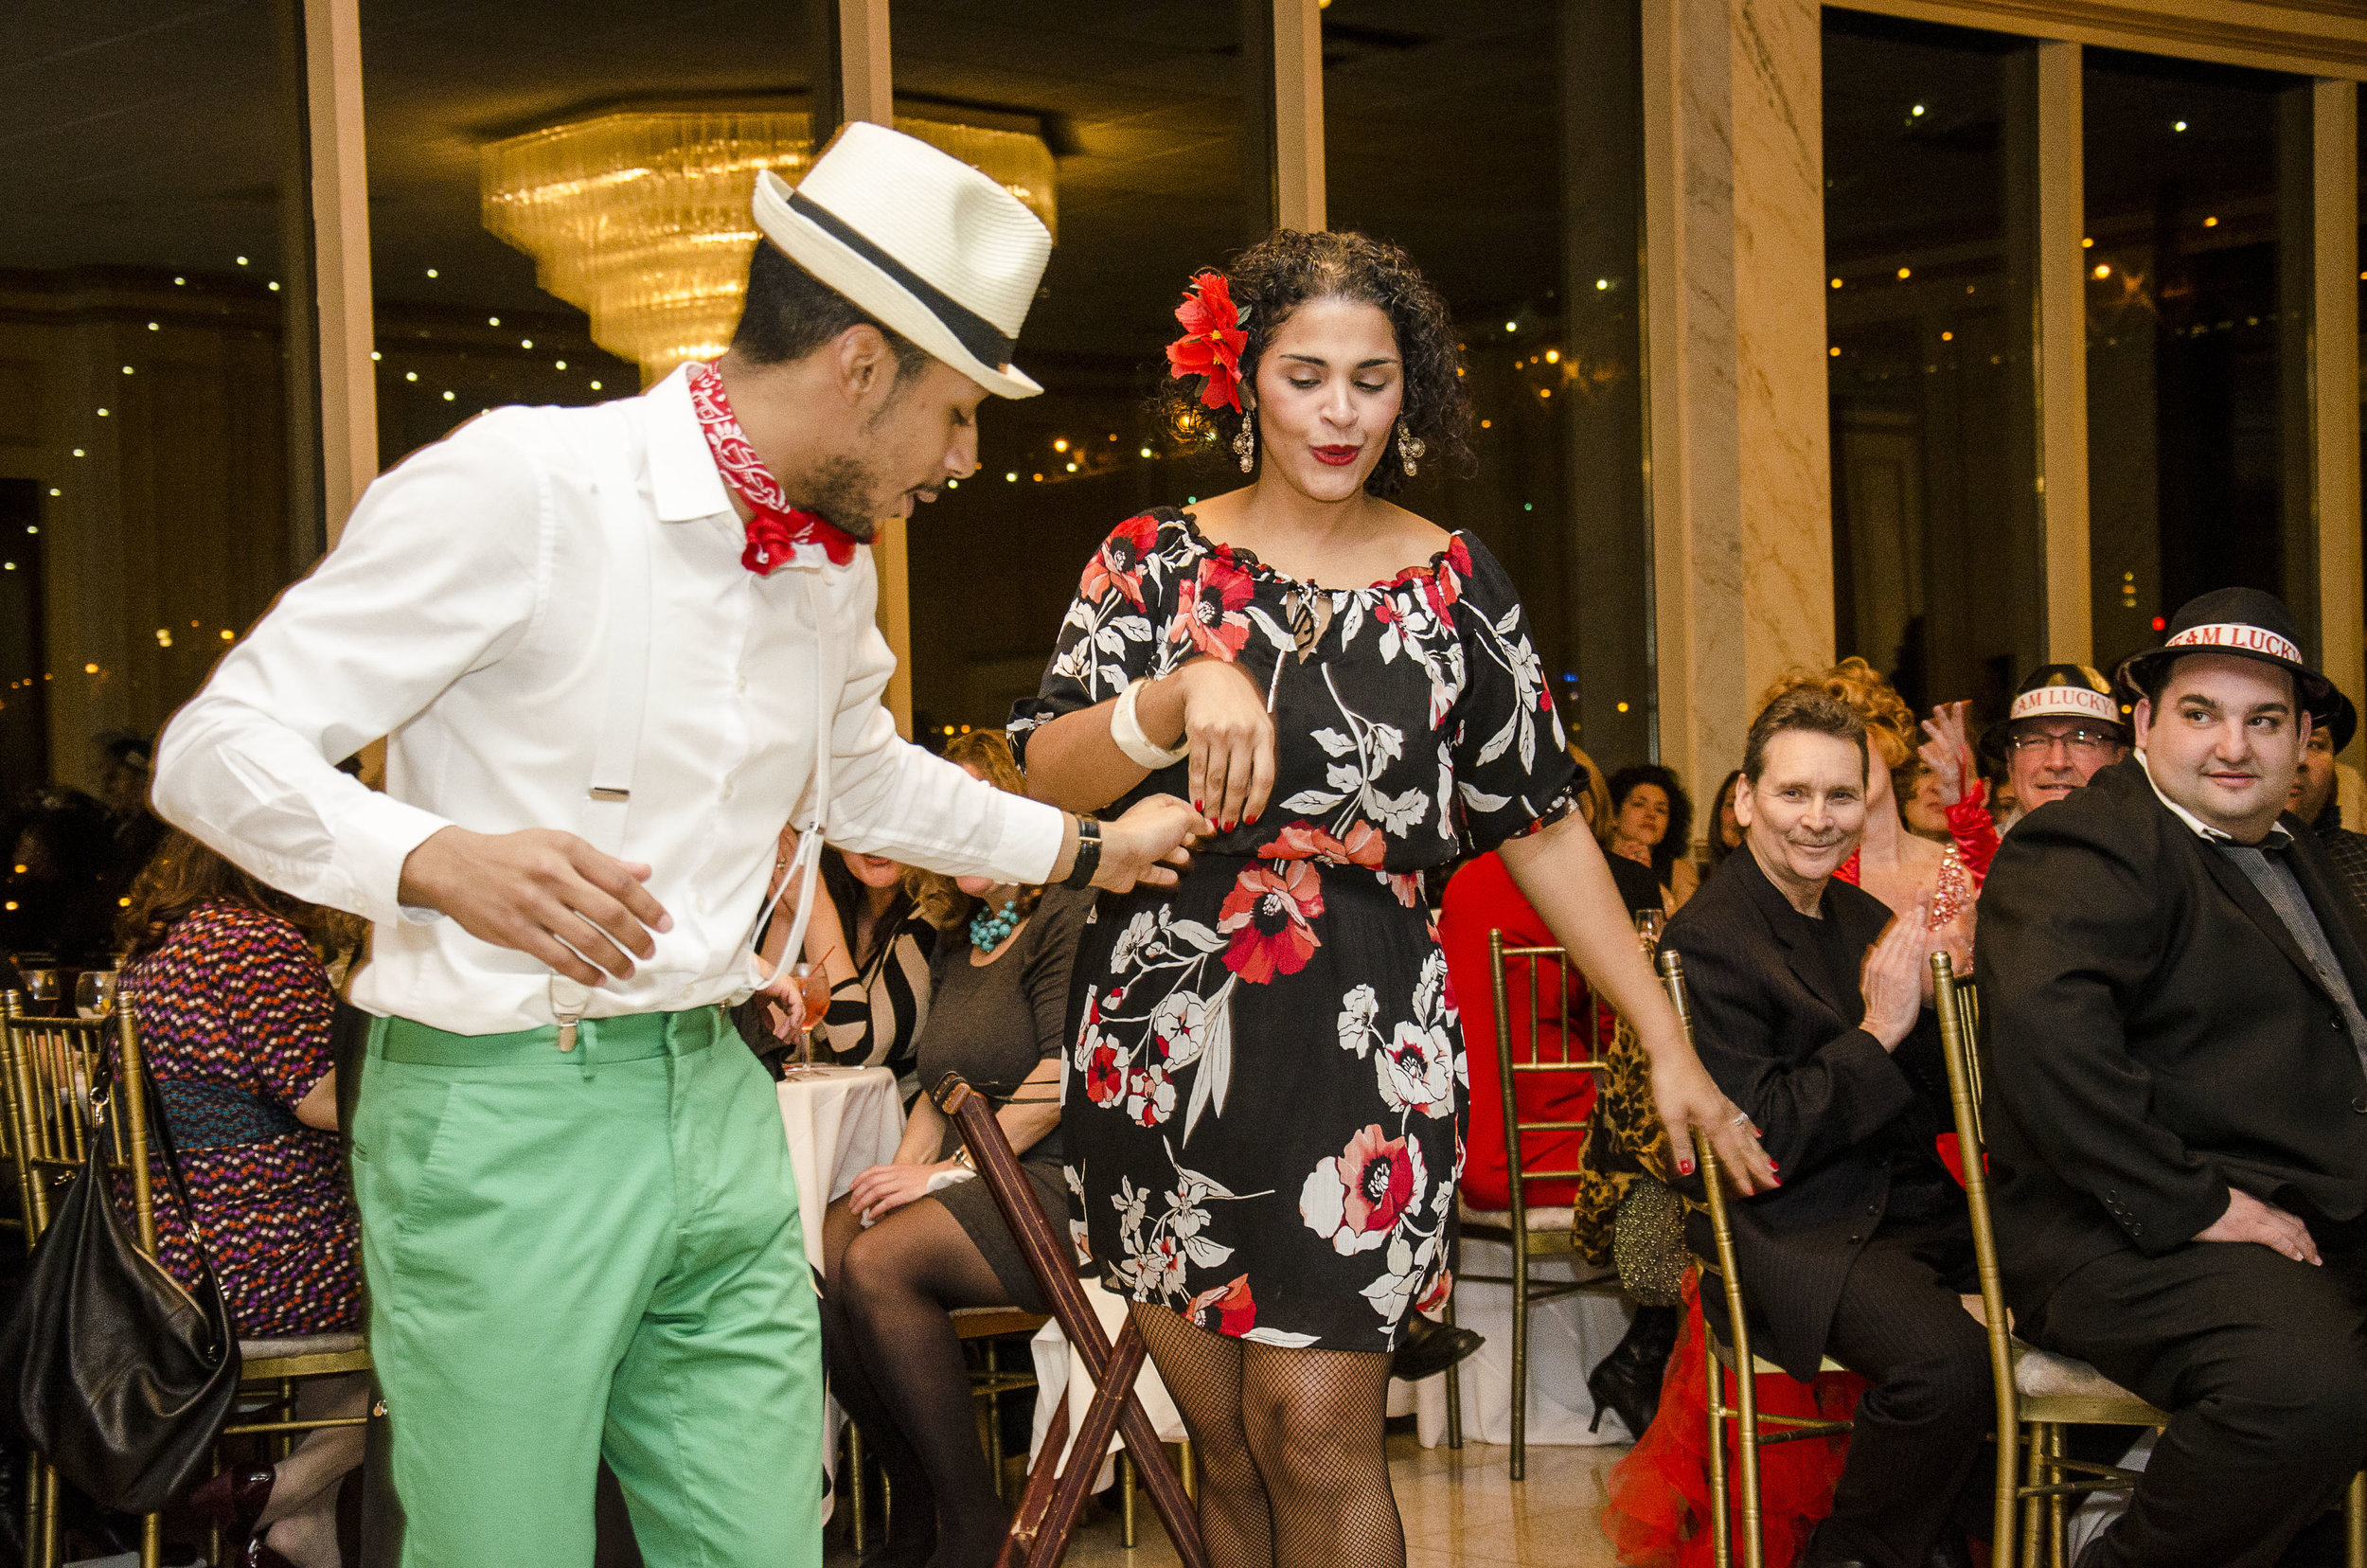 Council Member Antonio Reynoso danced with former Dep. Borough President Diana Reyna at the first Ready Sett Dance